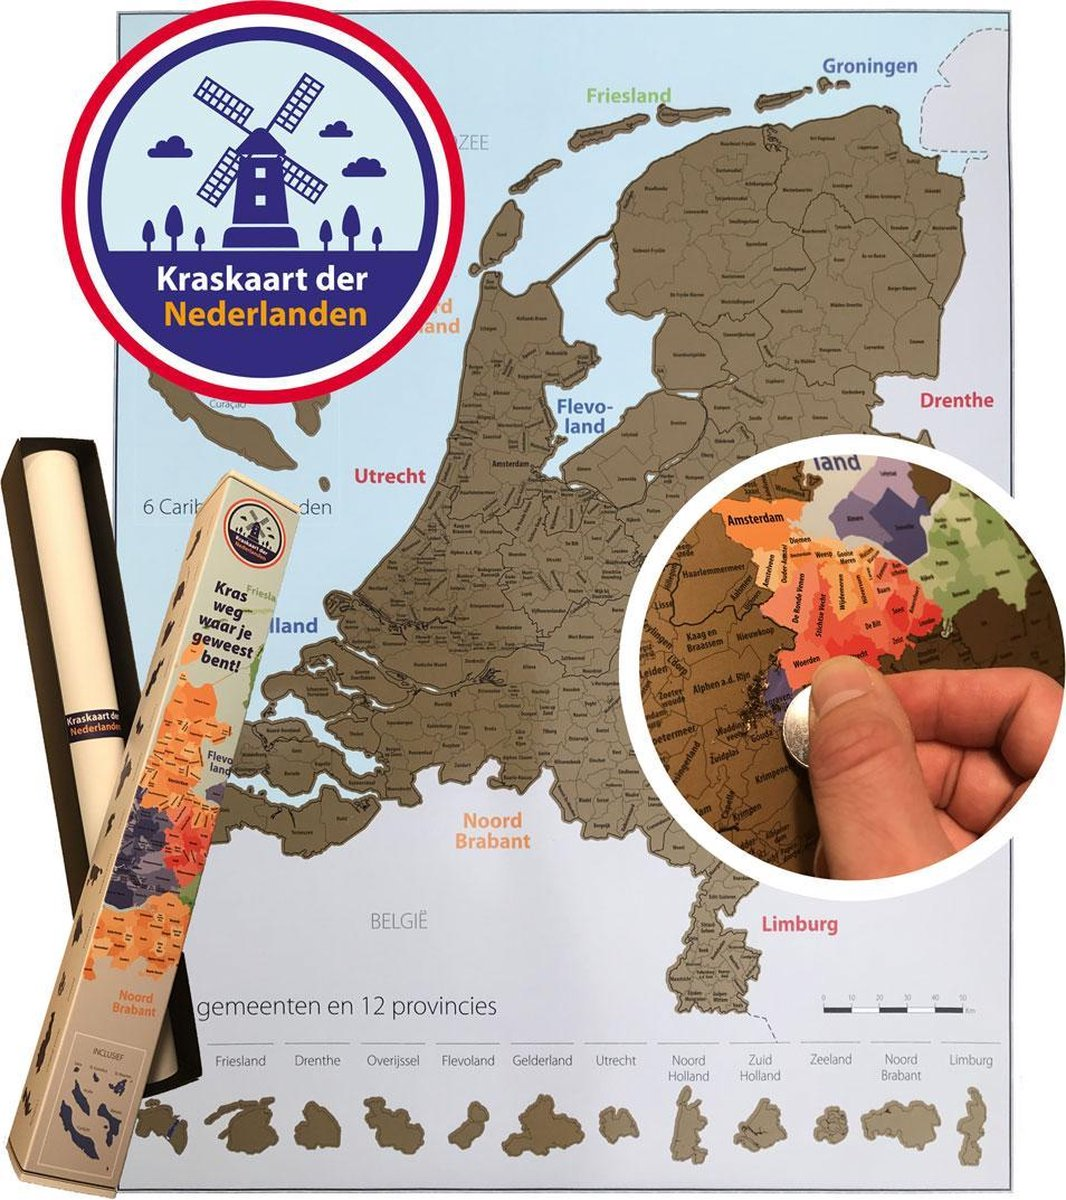 Kraskaart der Nederlanden - 56x44 cm - Kras weg waar in Nederland jij bent geweest - Scratchmap Nede